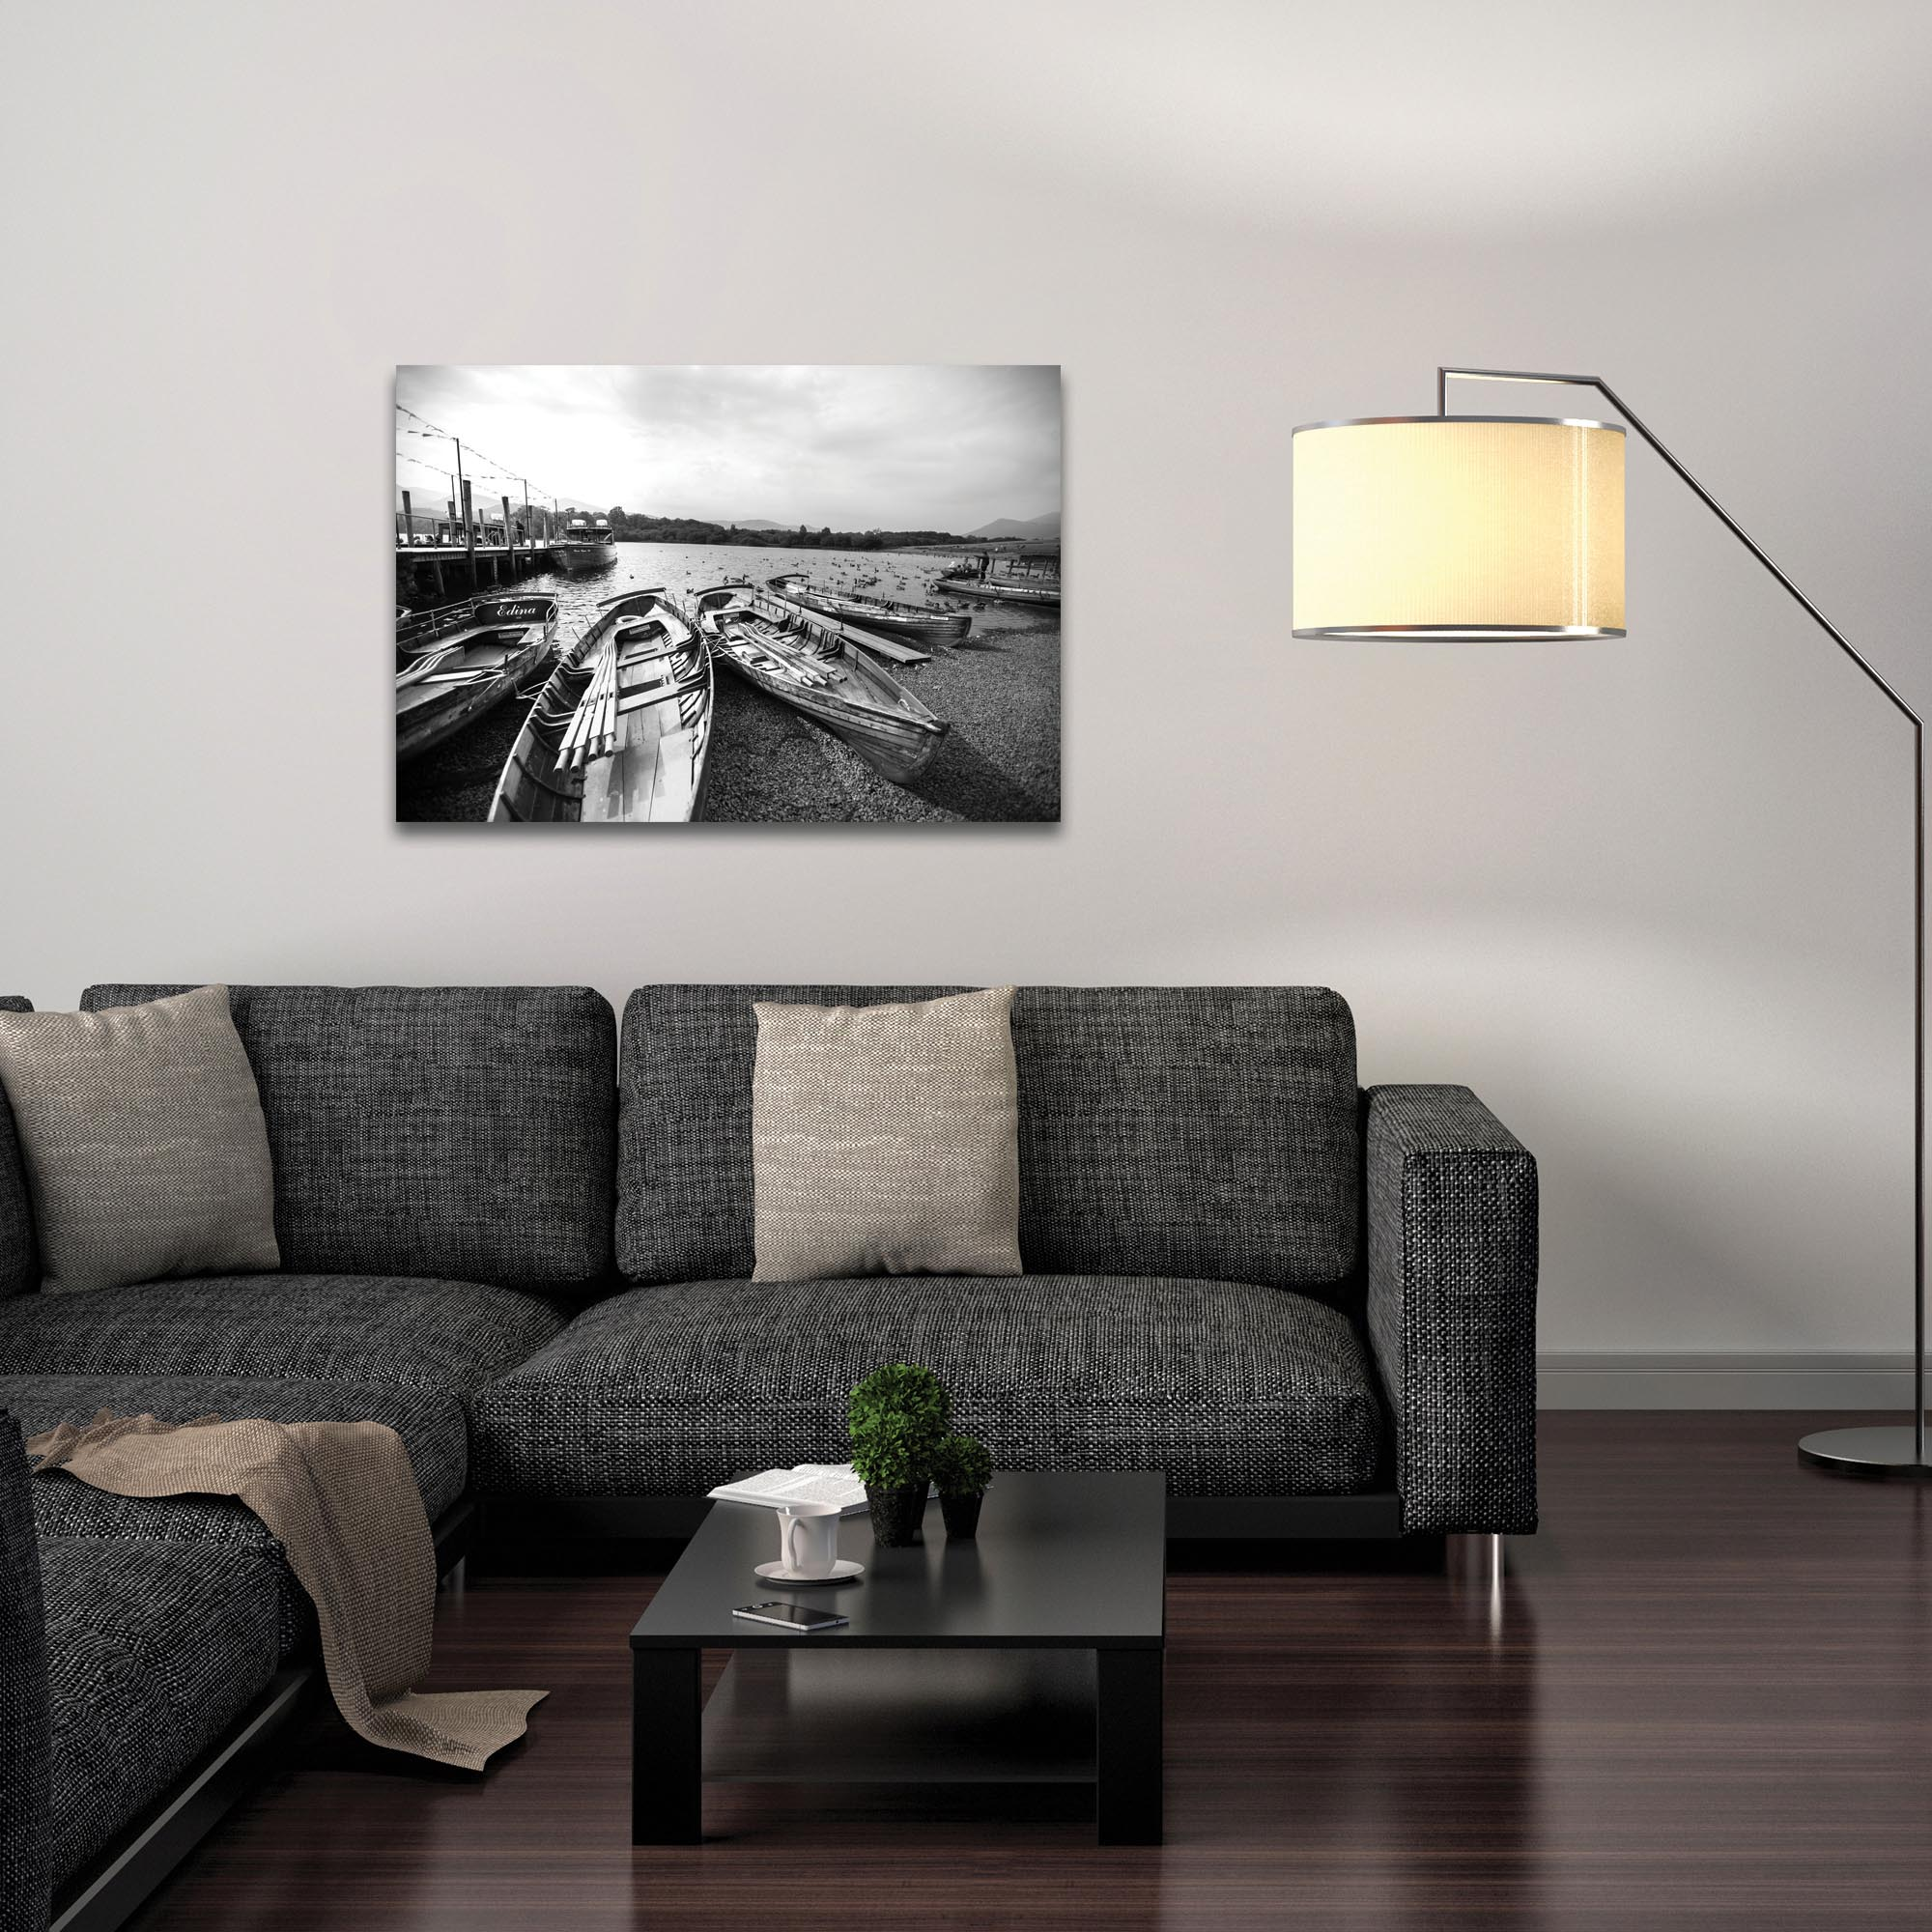 Black & White Photography 'Row of Rowers' - Coastal Art on Metal or Plexiglass - Lifestyle View